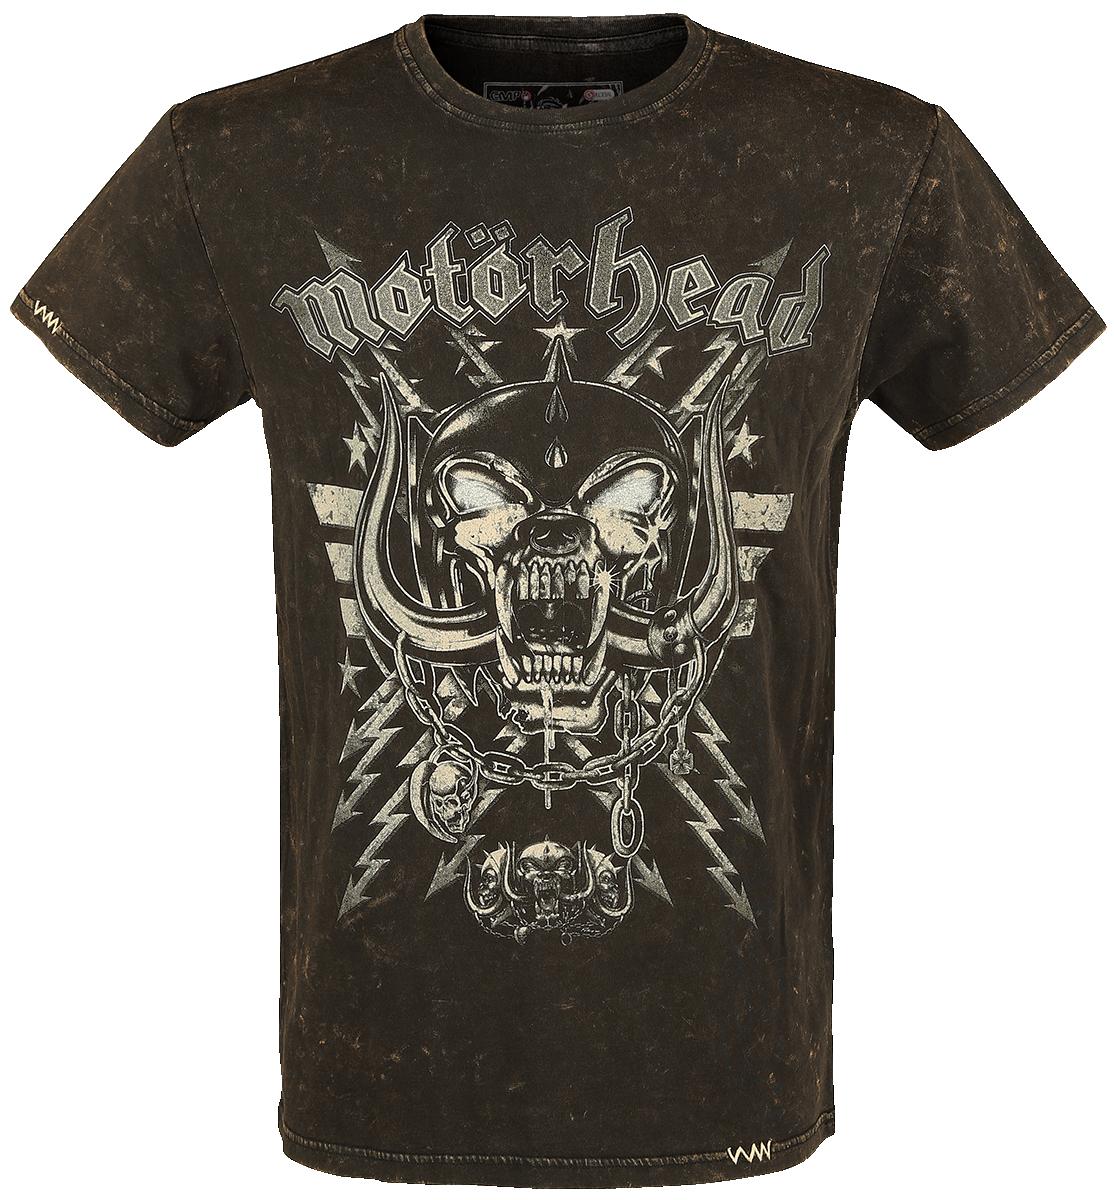 Motörhead -  - T-Shirt - brown image